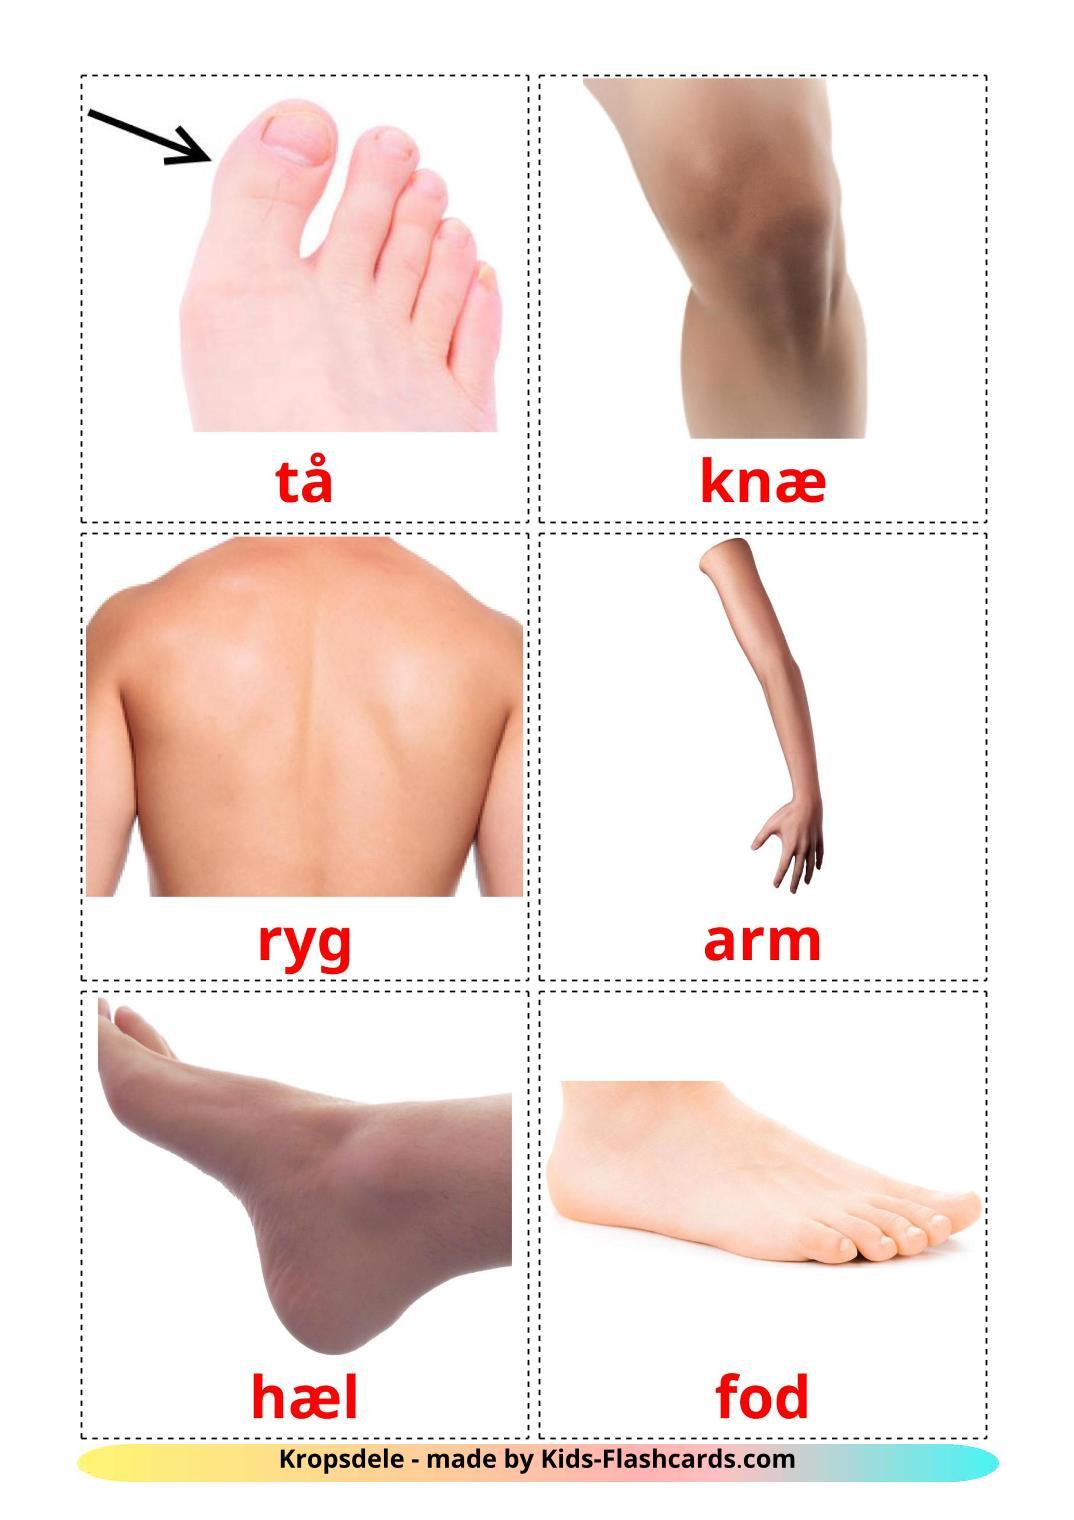 Body Parts - 26 Free Printable dansk Flashcards